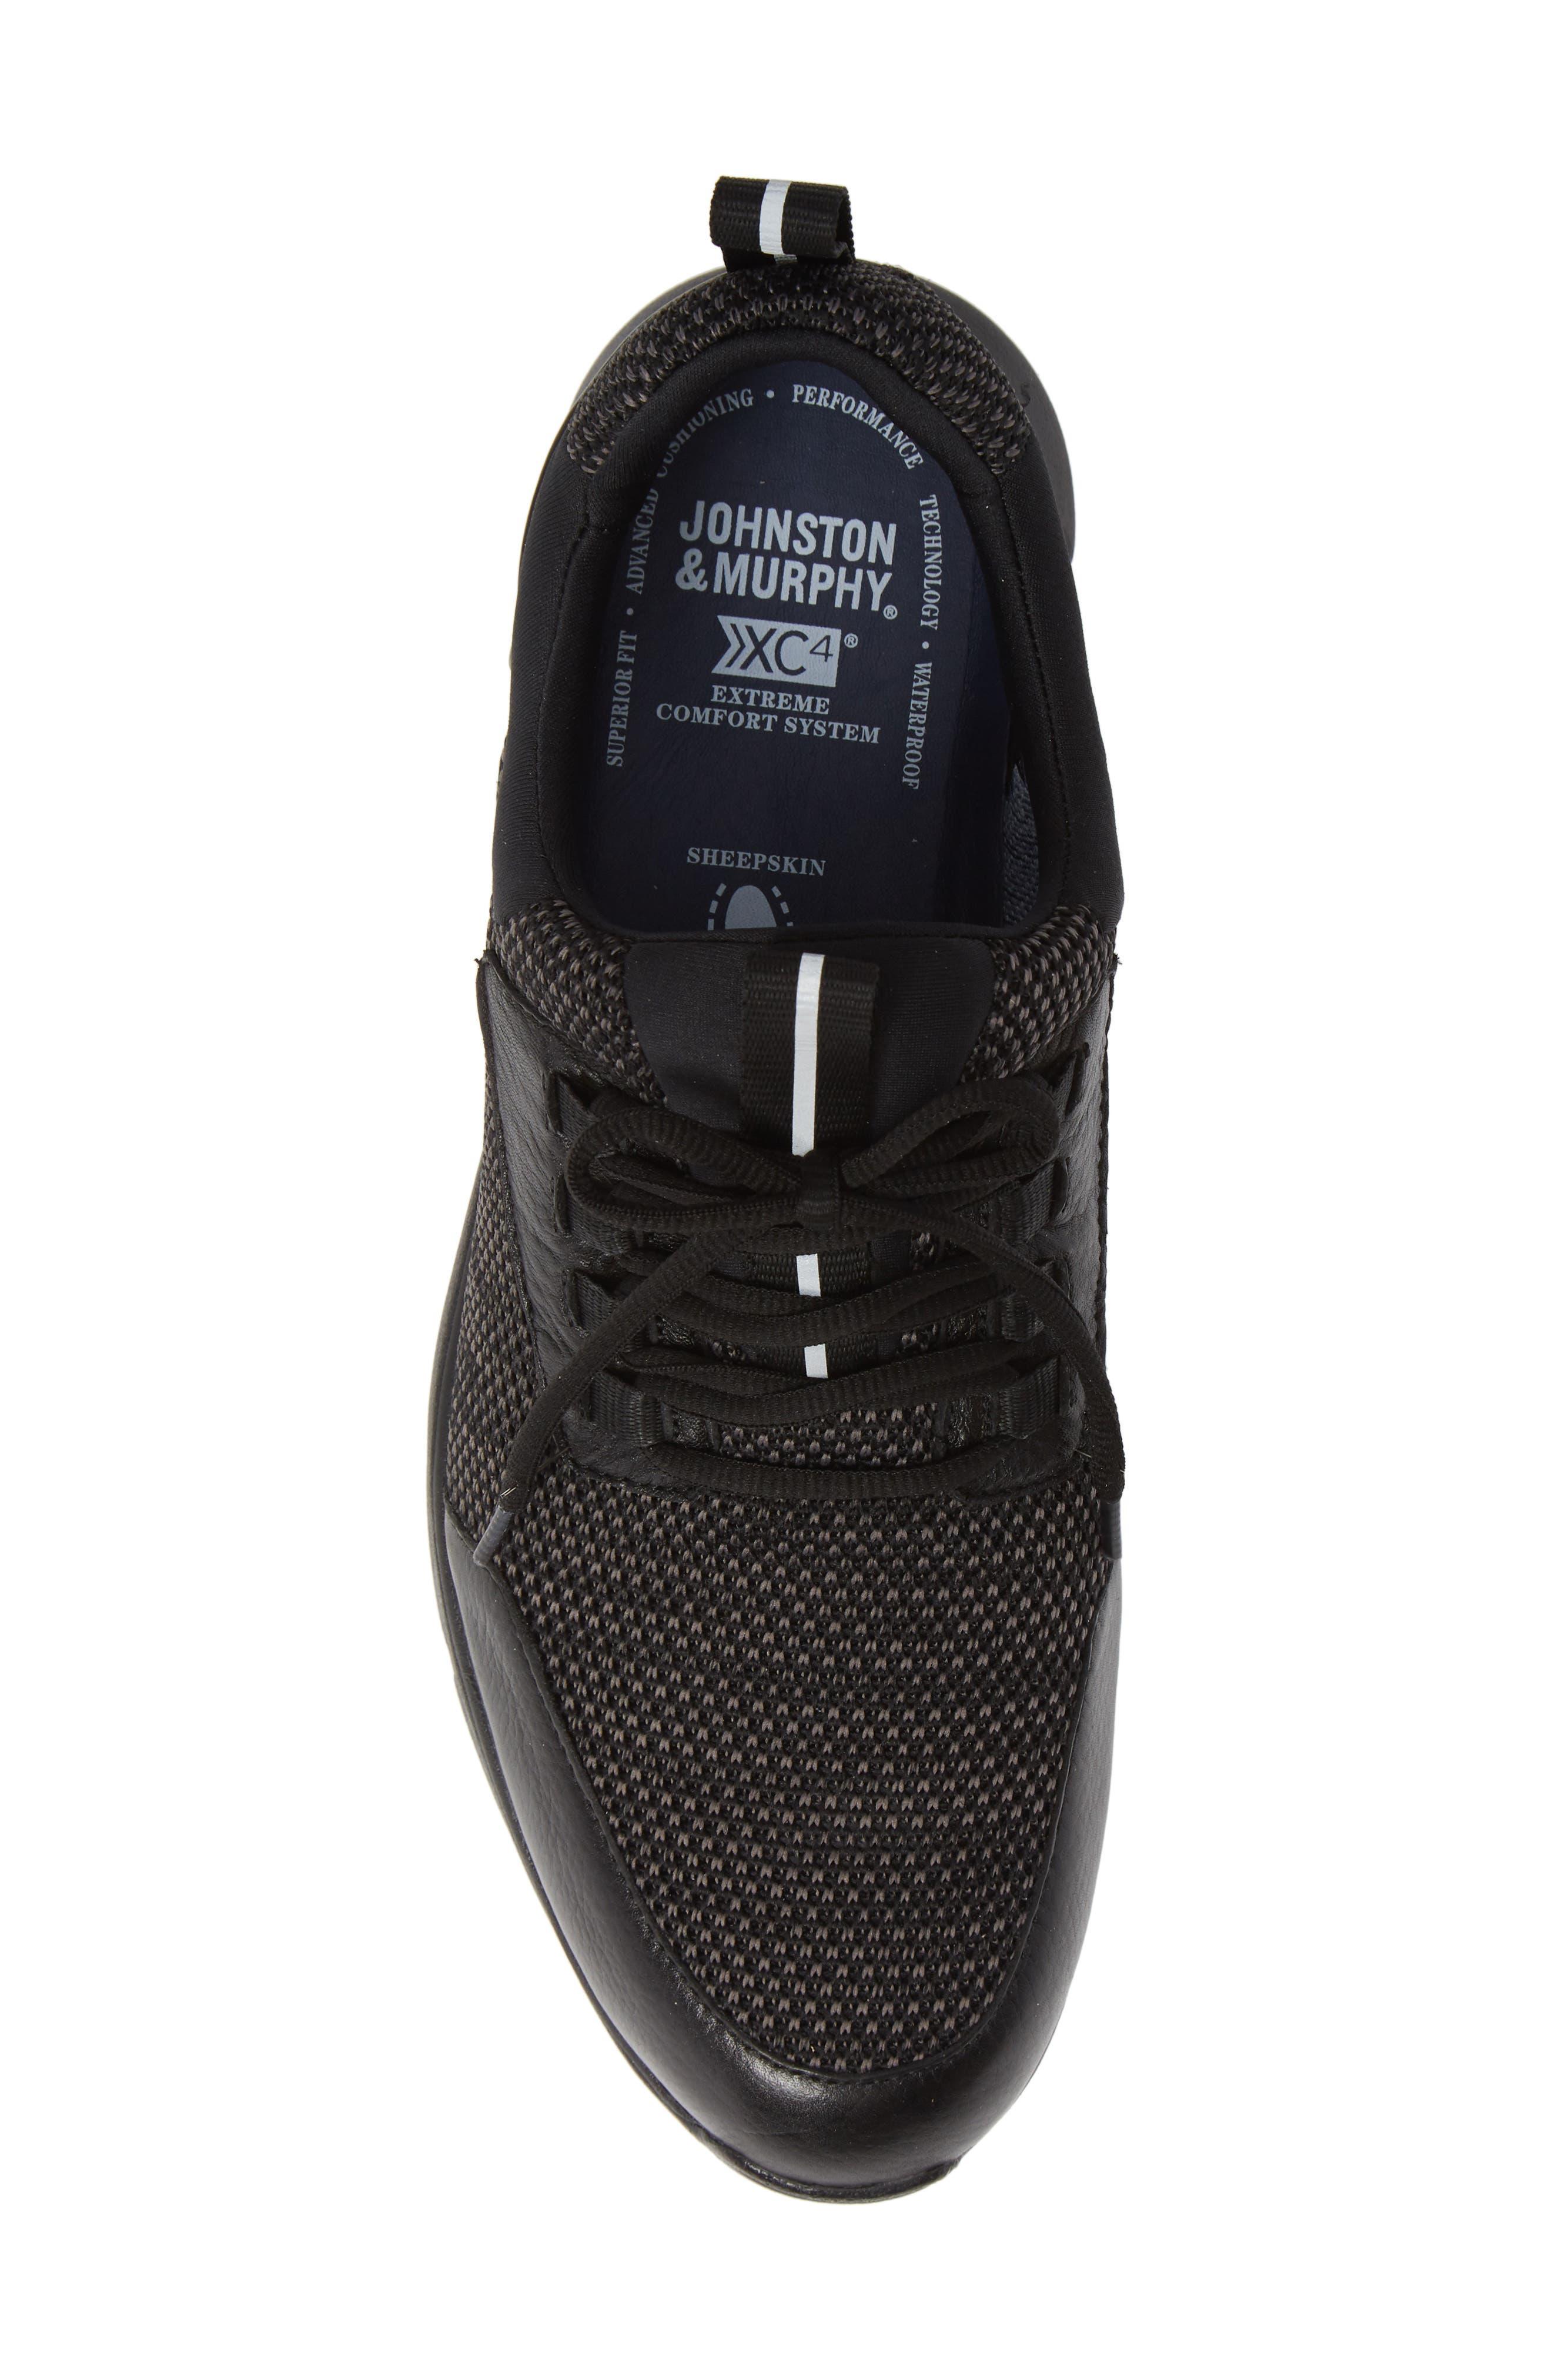 JOHNSTON & MURPHY, Prentiss XC4<sup>®</sup> Waterproof Sneaker, Alternate thumbnail 5, color, BLACK LEATHER